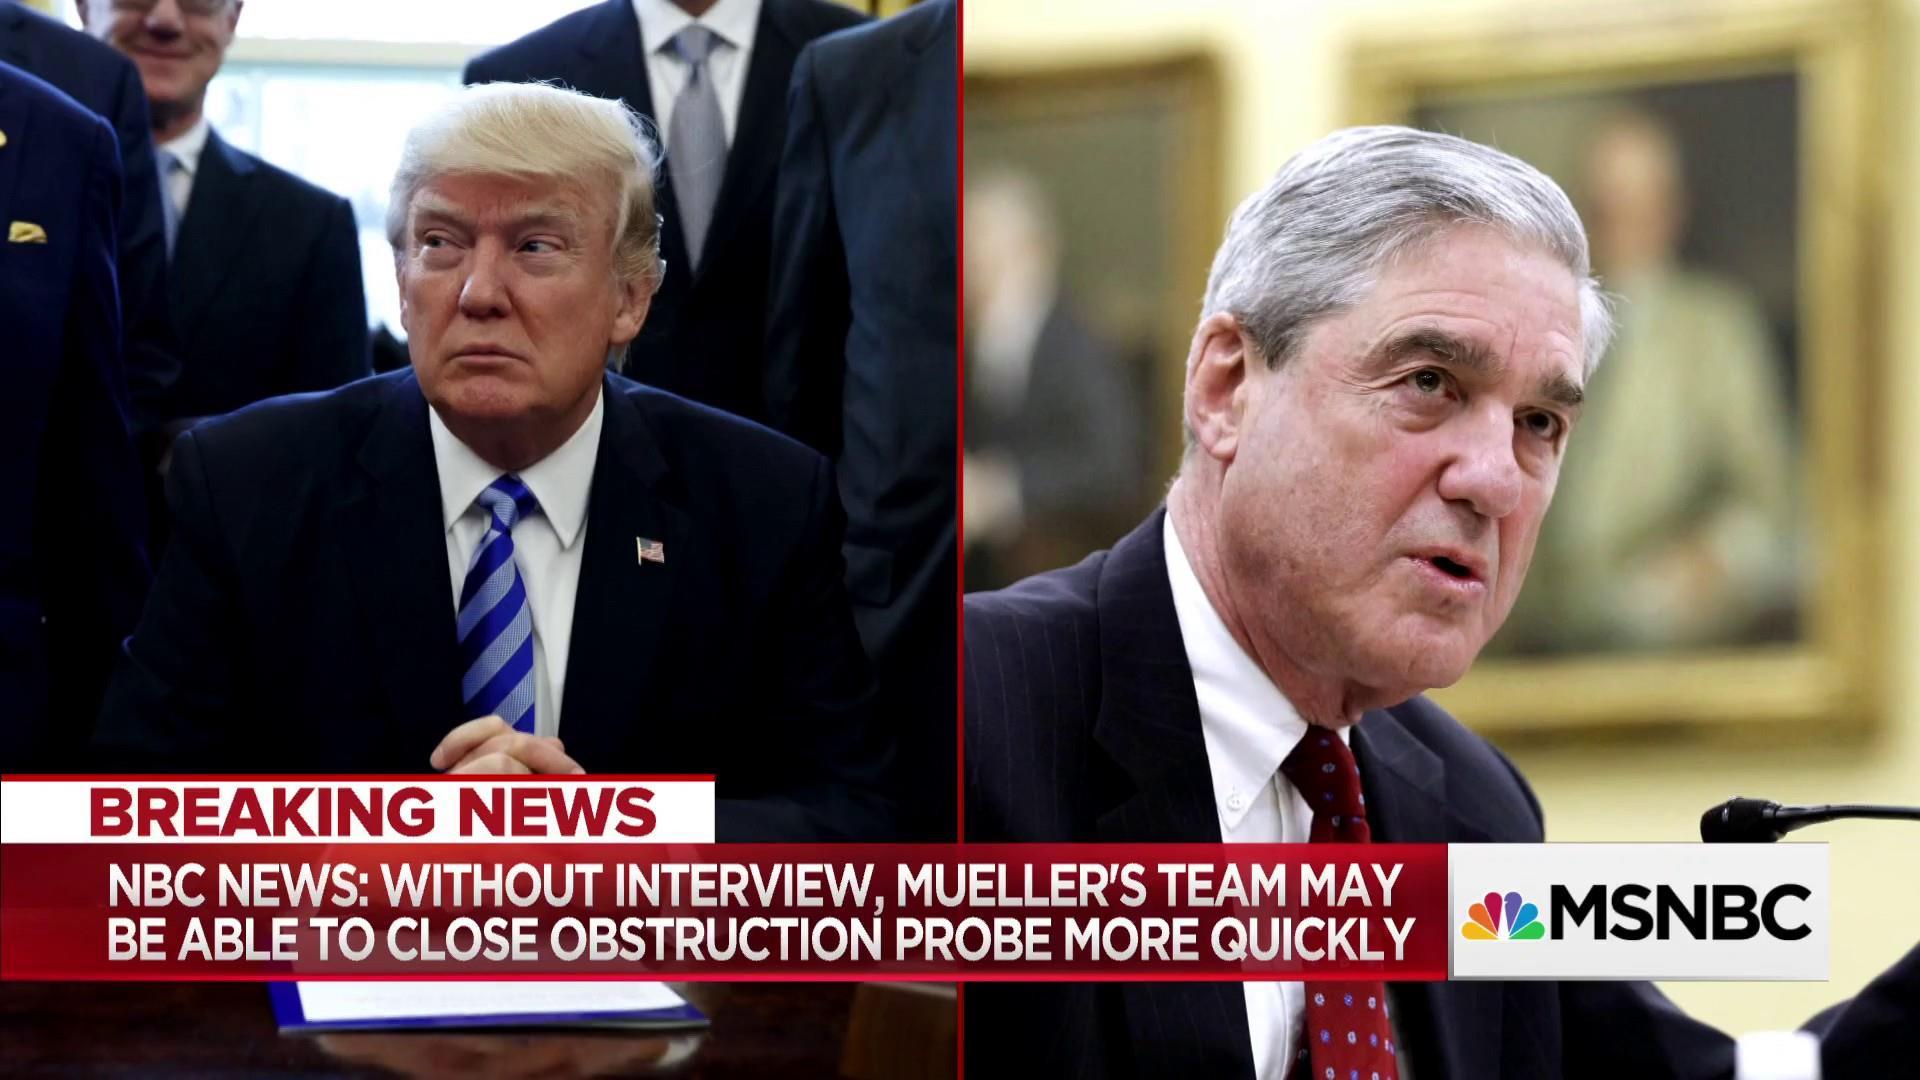 Talks between Robert Mueller and Pres  Trump teams collapse after FBI raid  on Michael Cohen